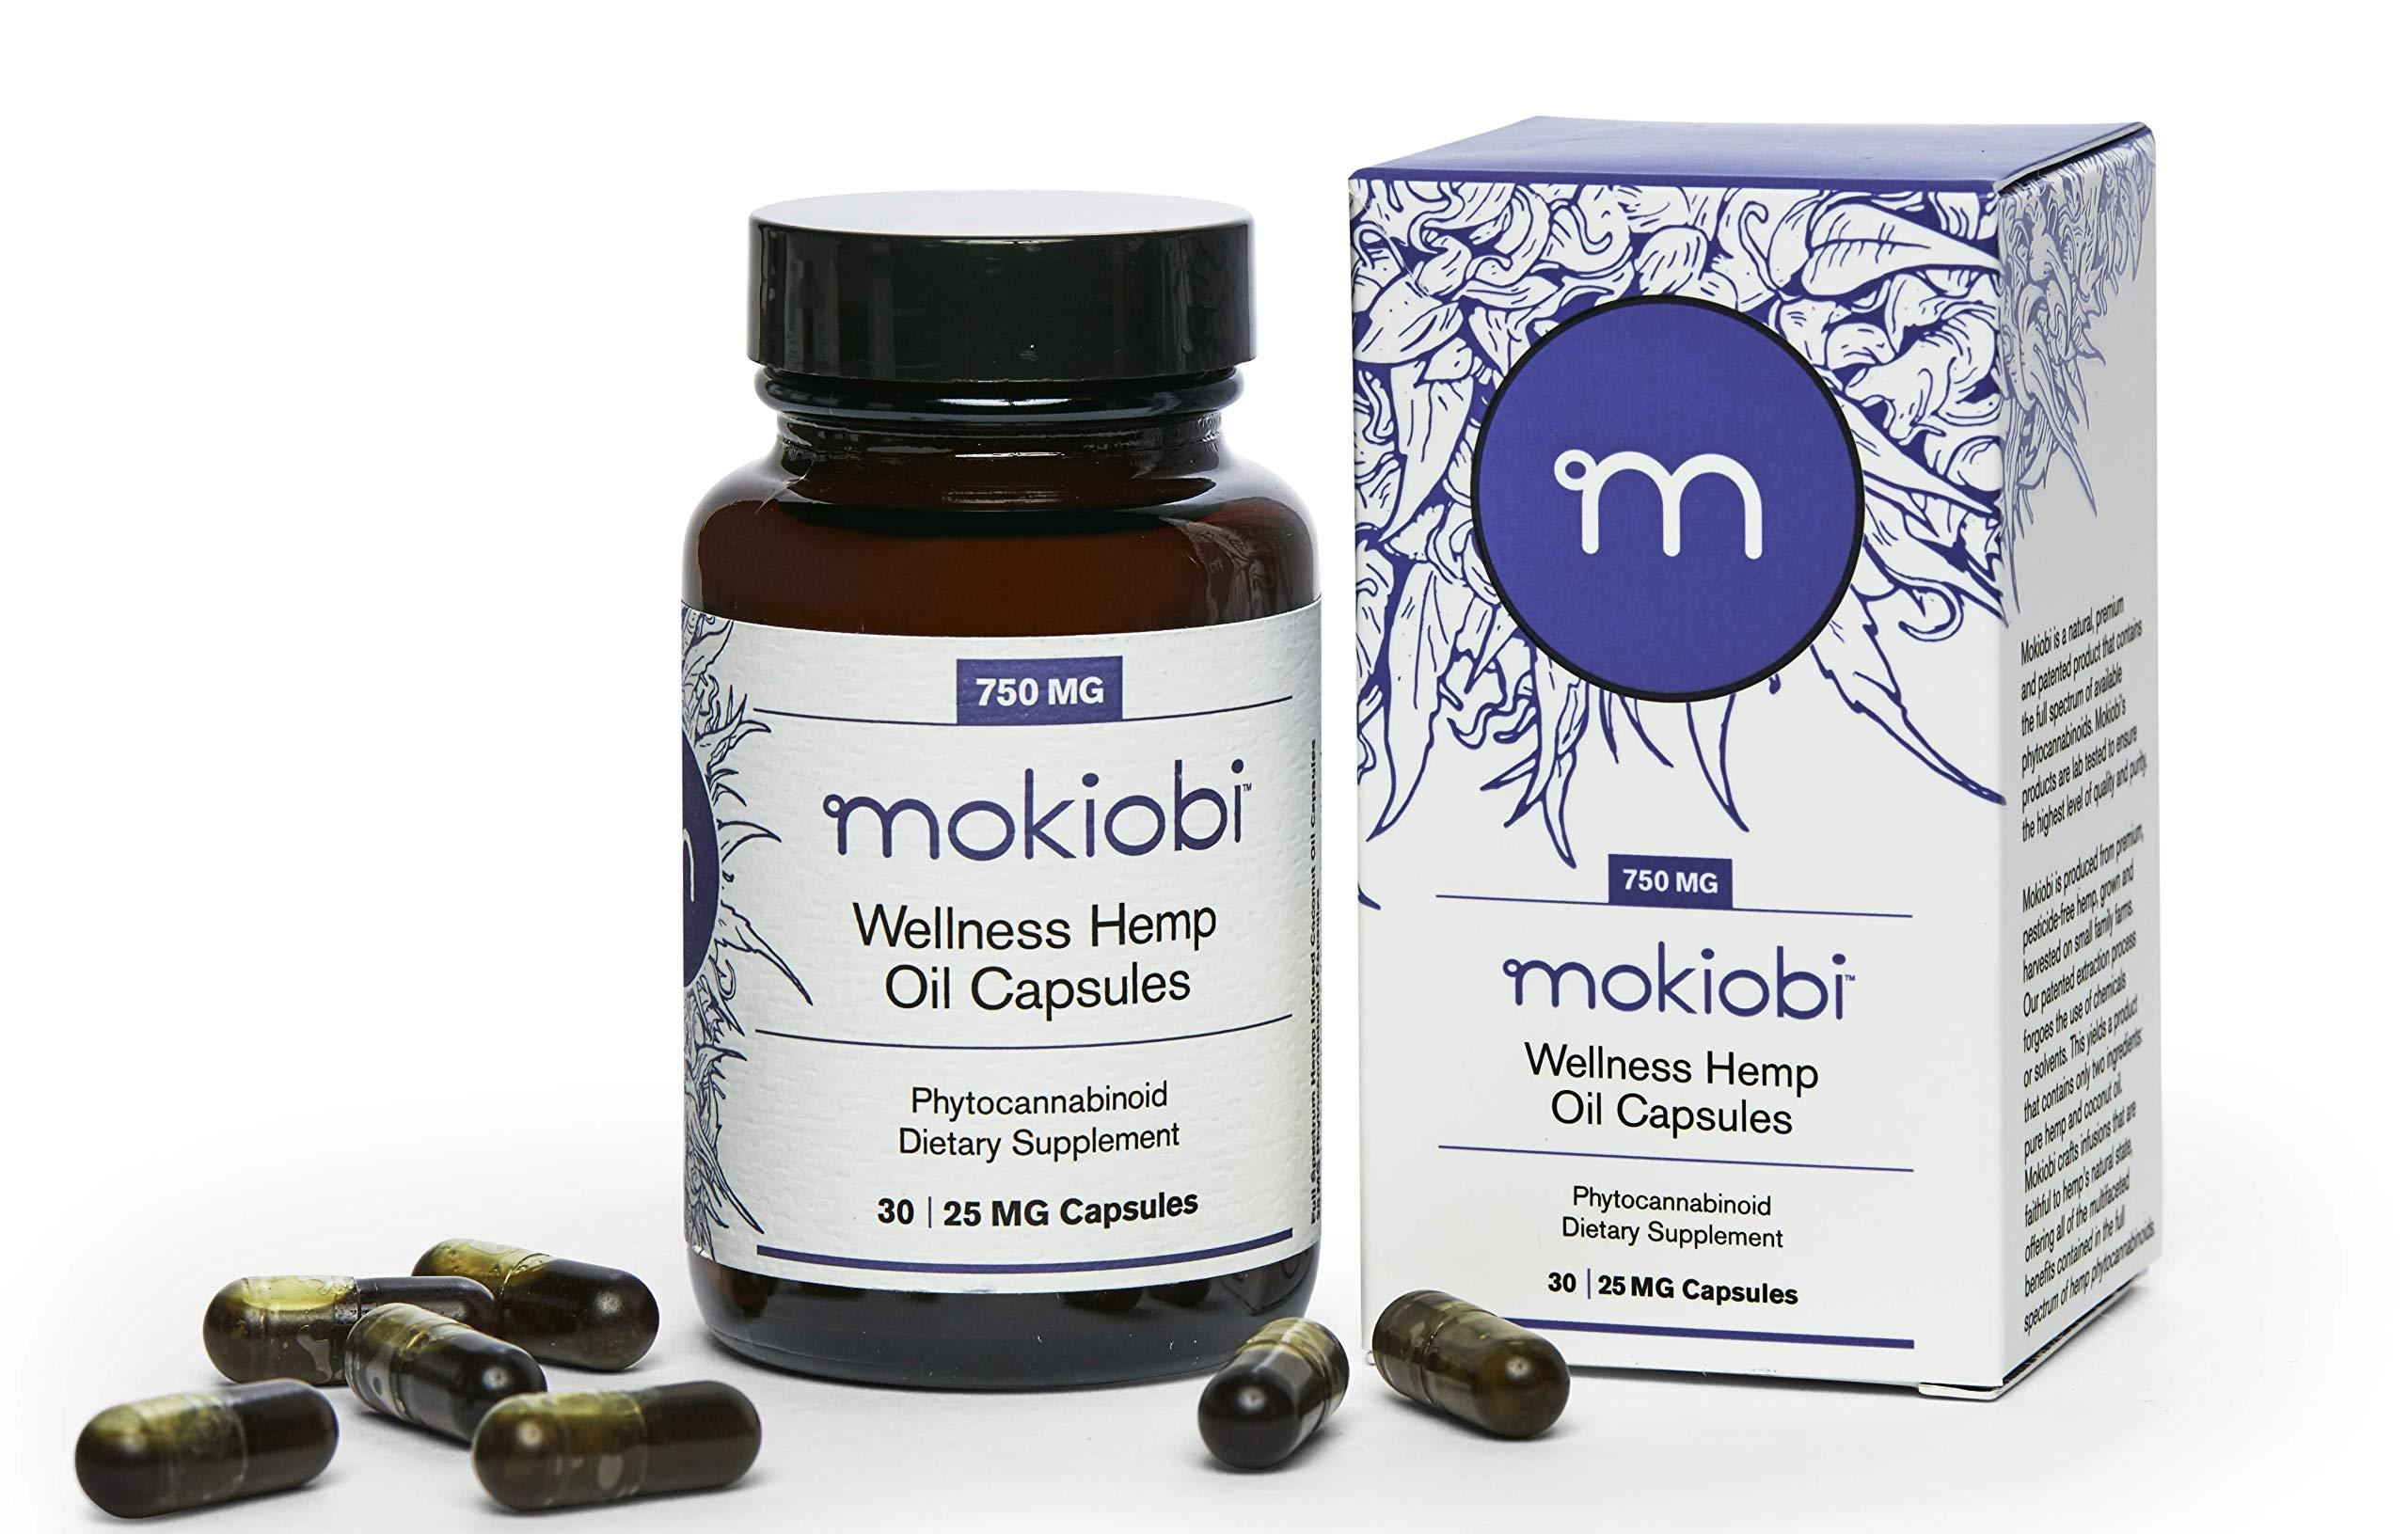 Mokiobi Whole Hemp Plant Infused Coconut Oil Wellness Capsules 750mg (30 Count, 25mg Capsules) by Mokiobi